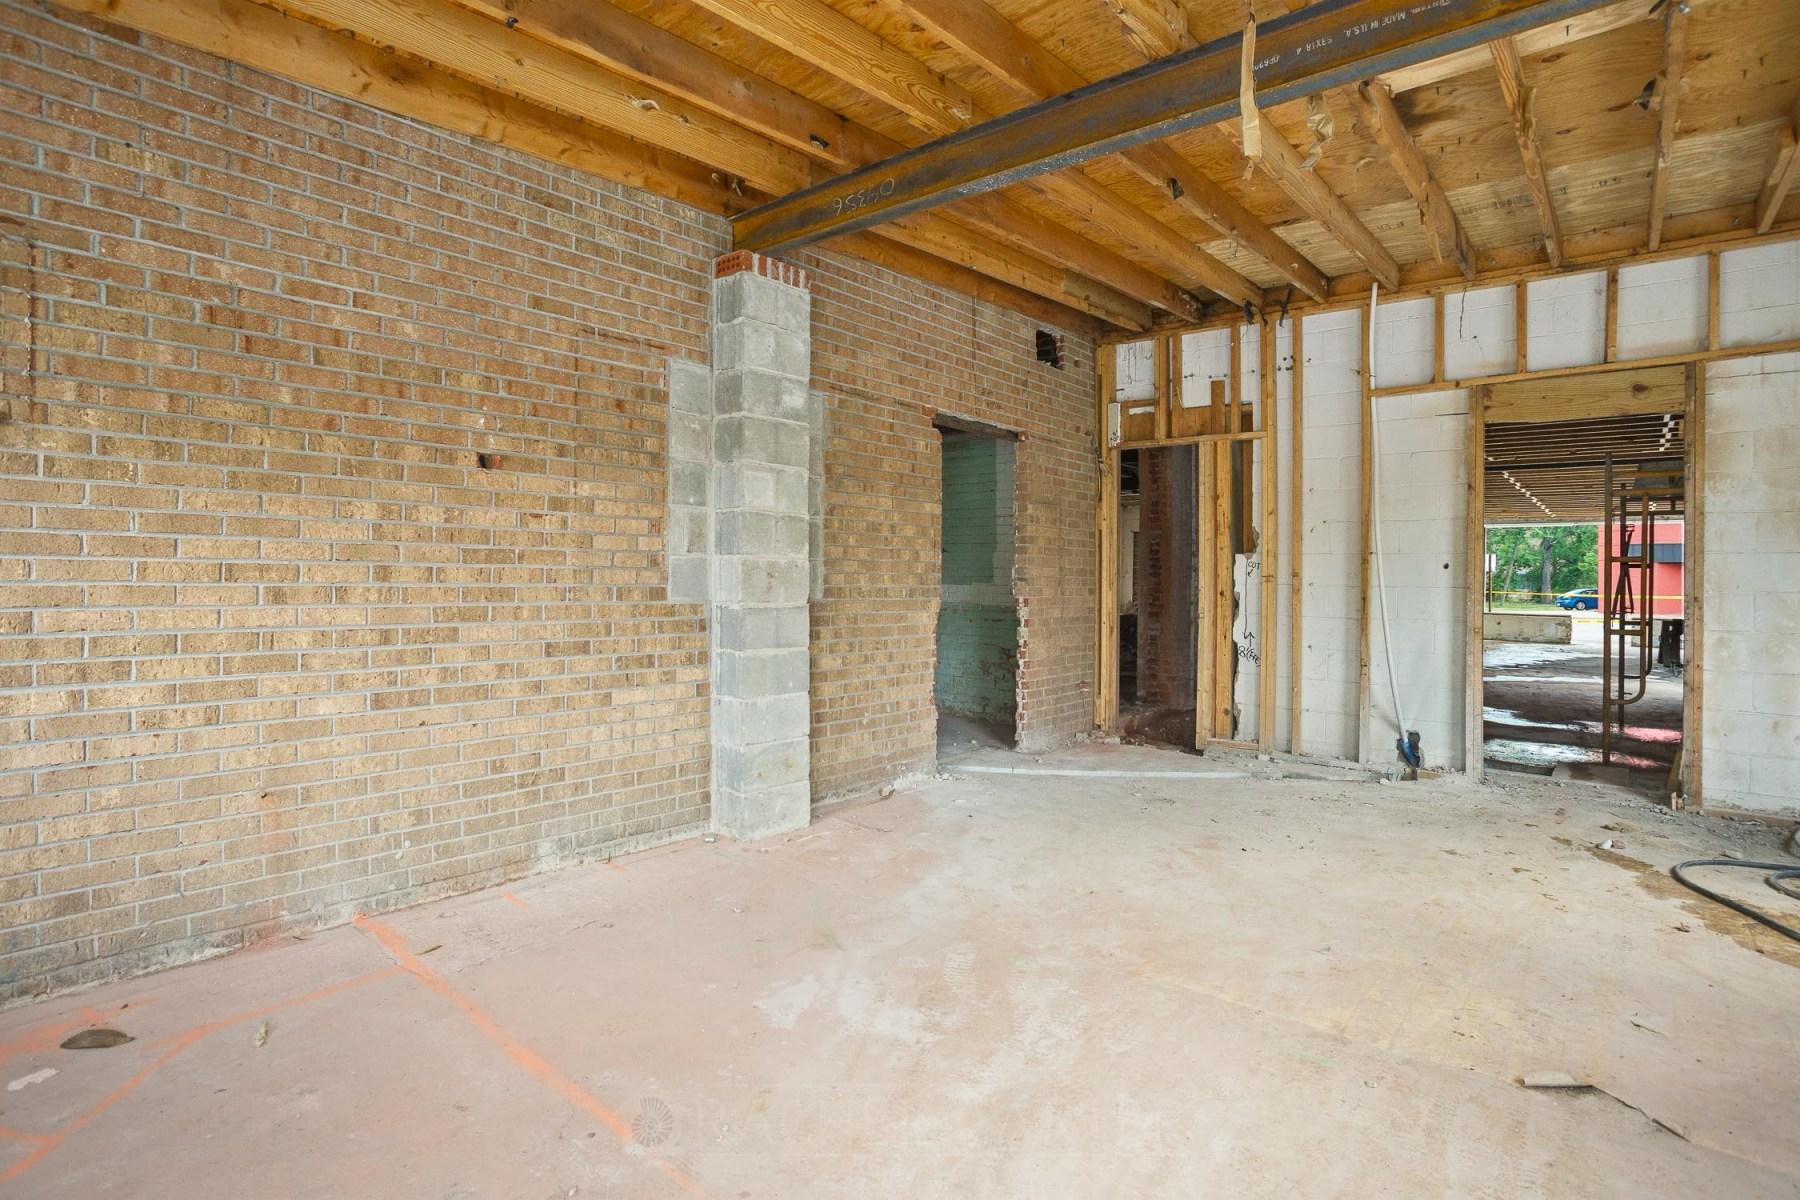 Horizons-East-Office-Renovation-1st-Set-27May2021_SB_01279_web-size